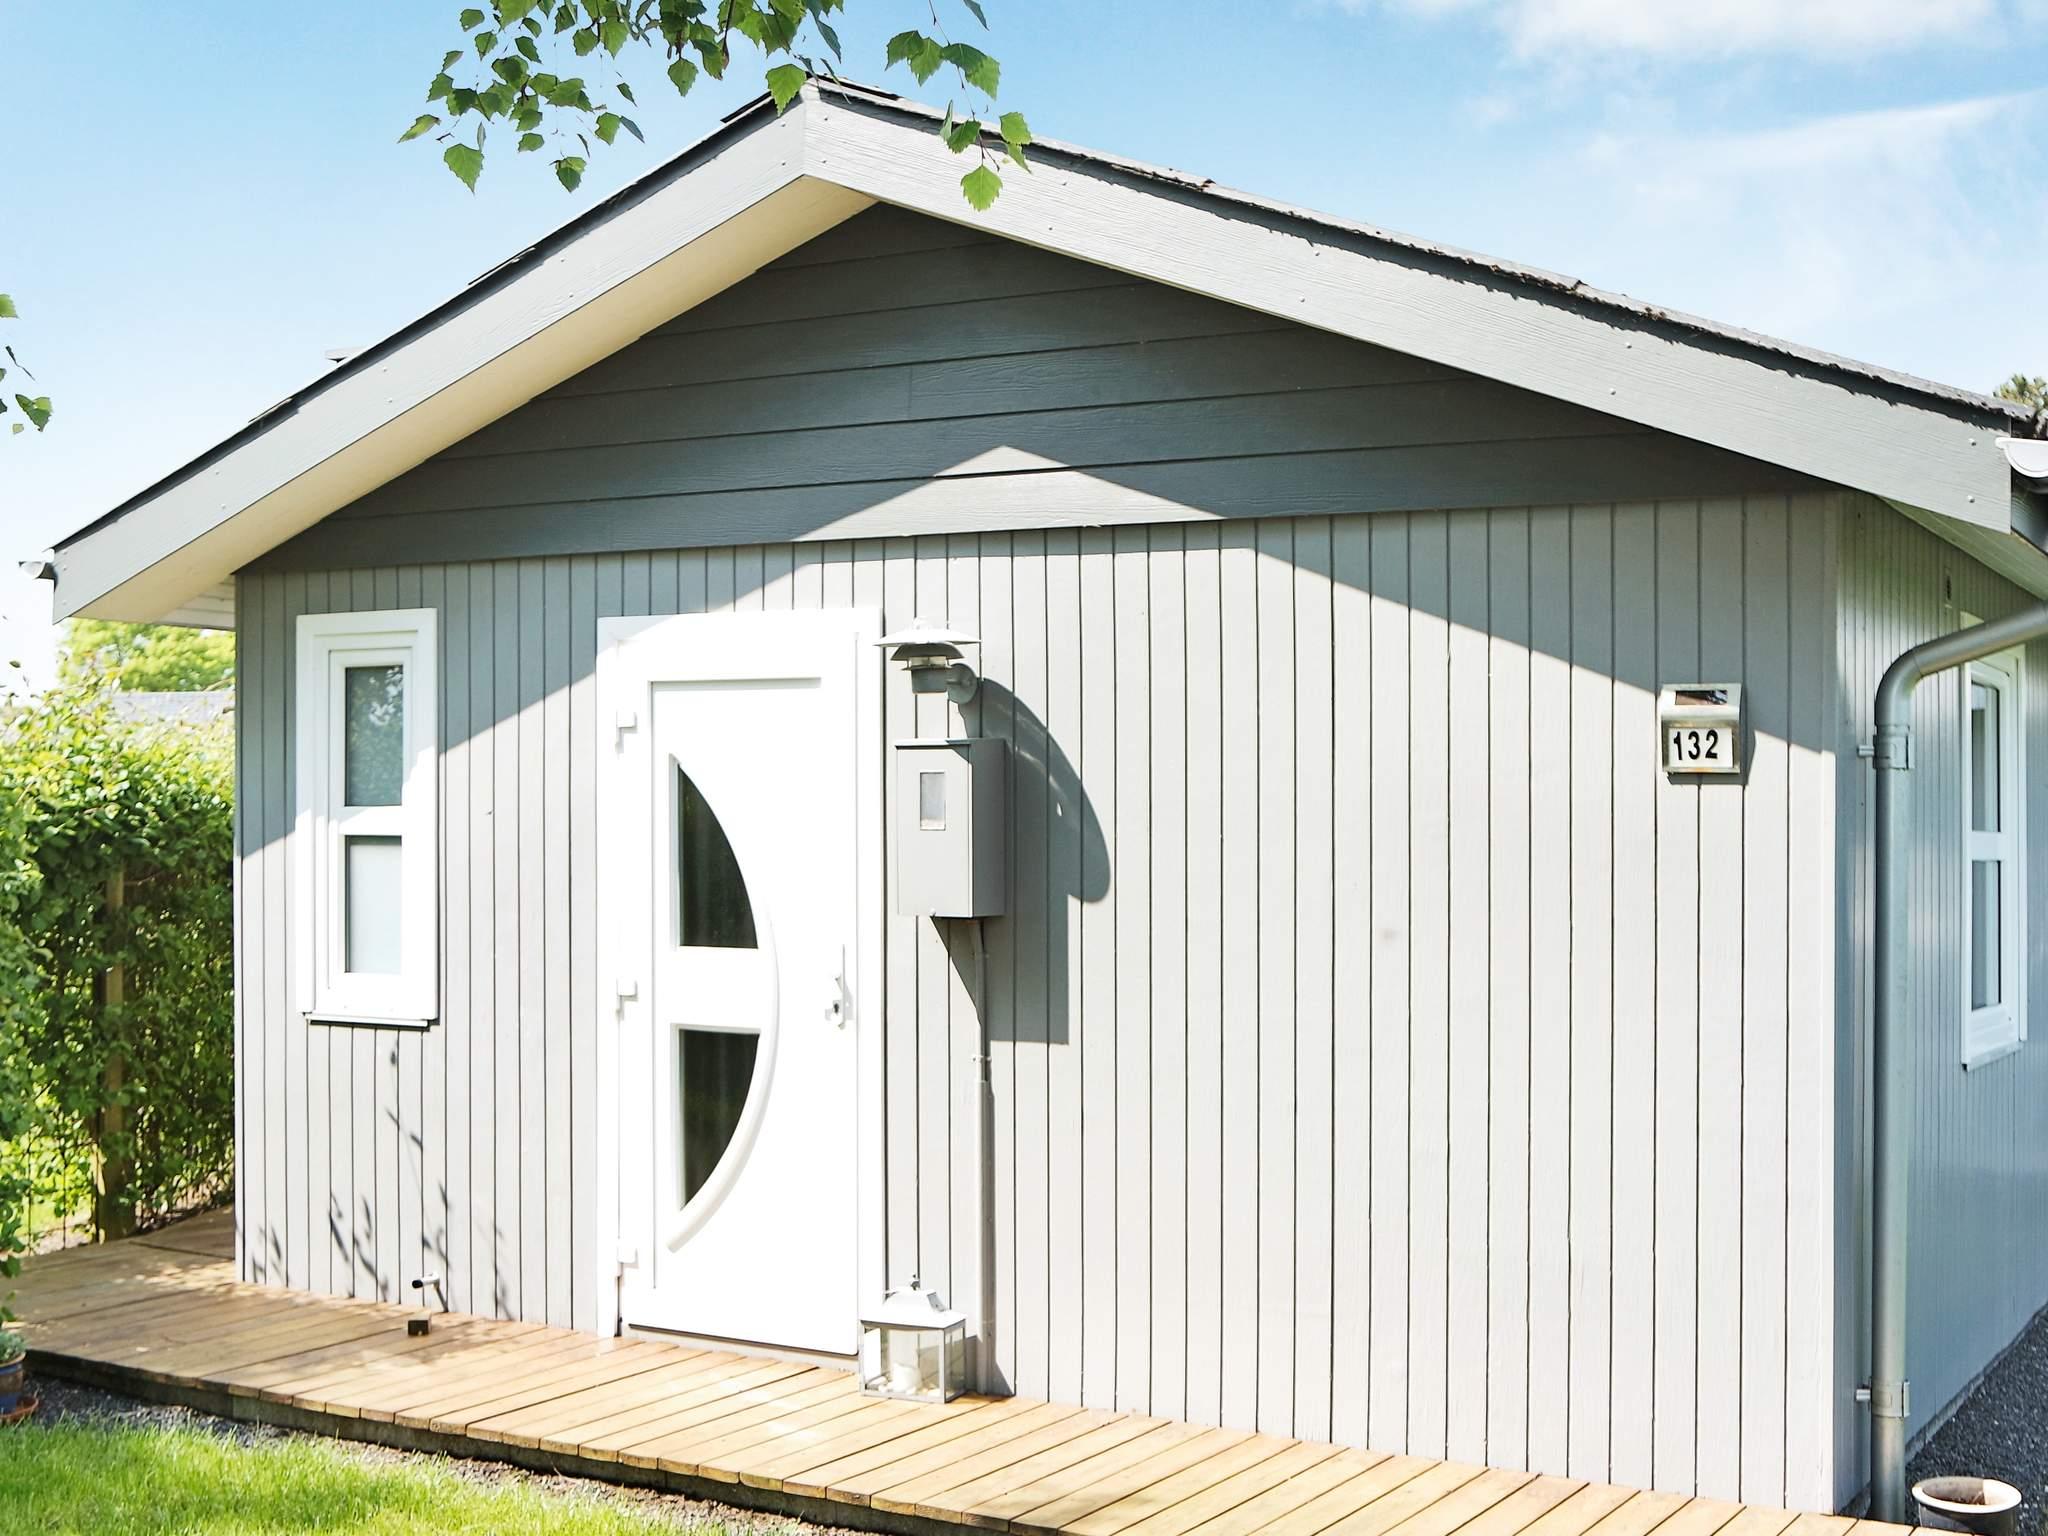 Ferienhaus Øster Hurup (85519), Øster Hurup, , Ostjütland, Dänemark, Bild 7